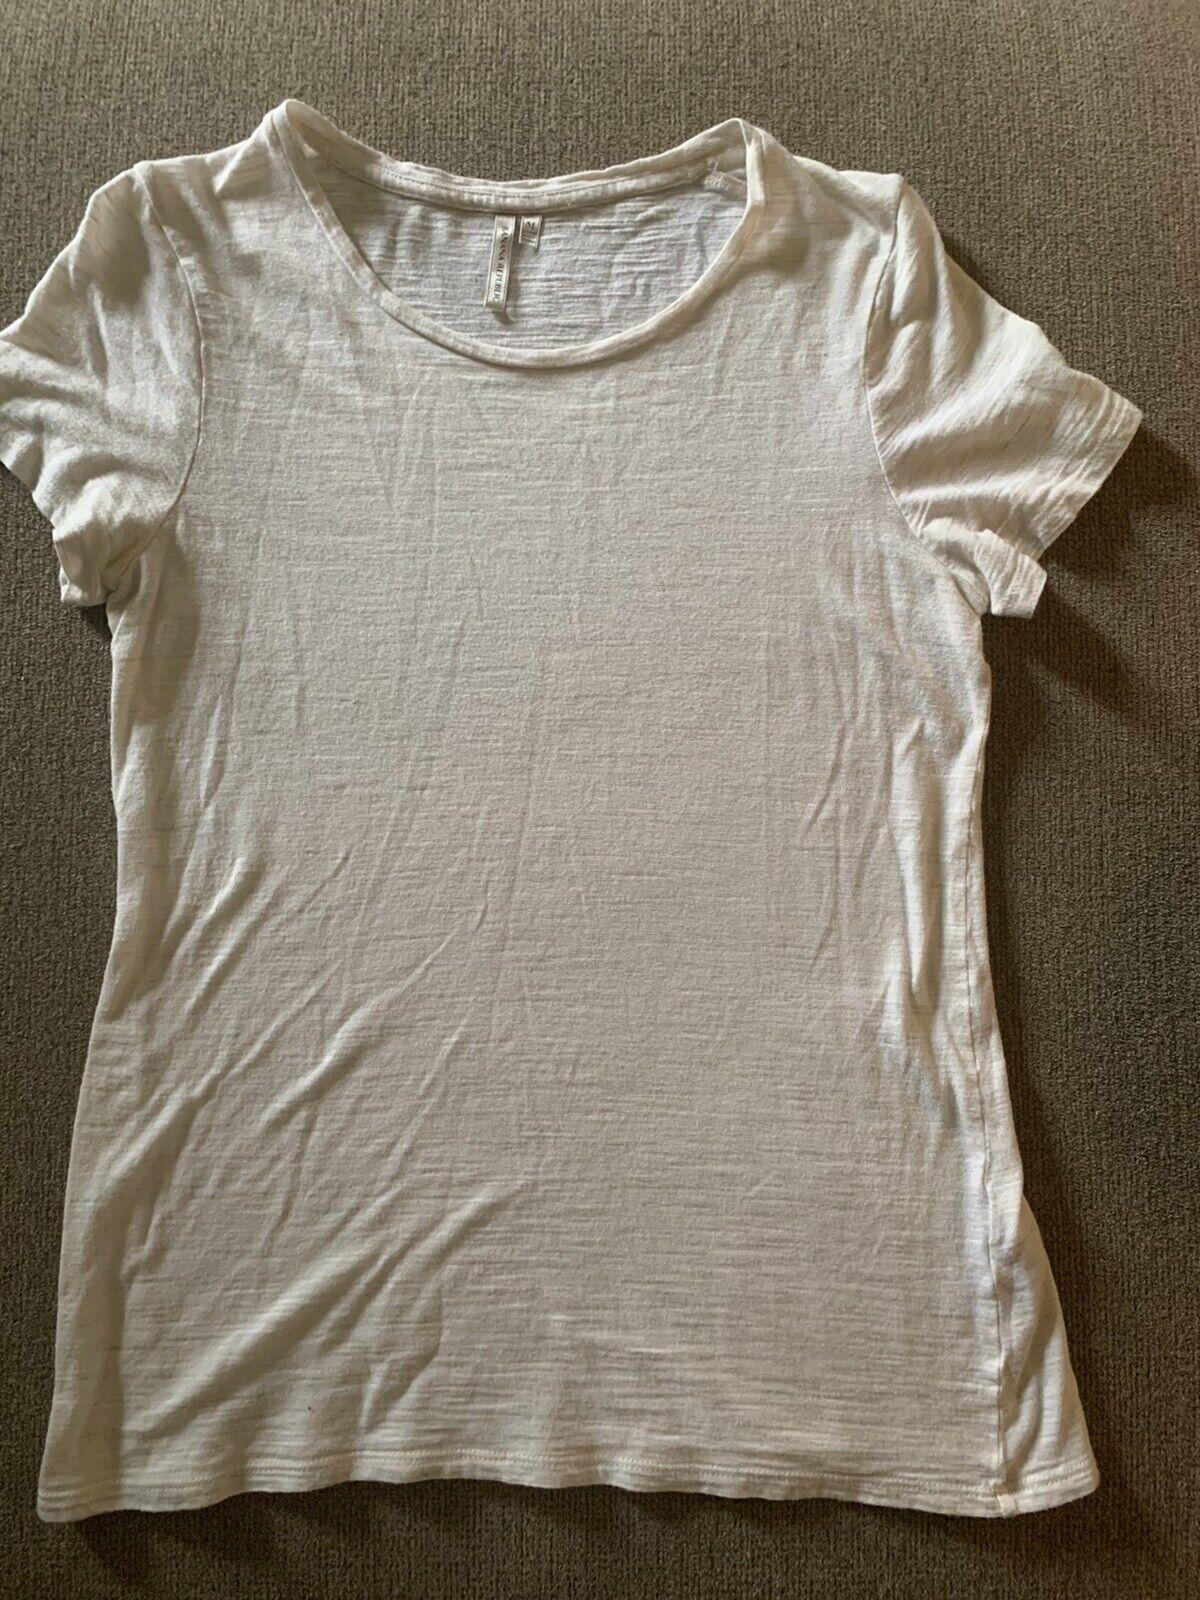 BANANA REPUBLIC Women's M Cream Soft Organic Blend T-Shirt